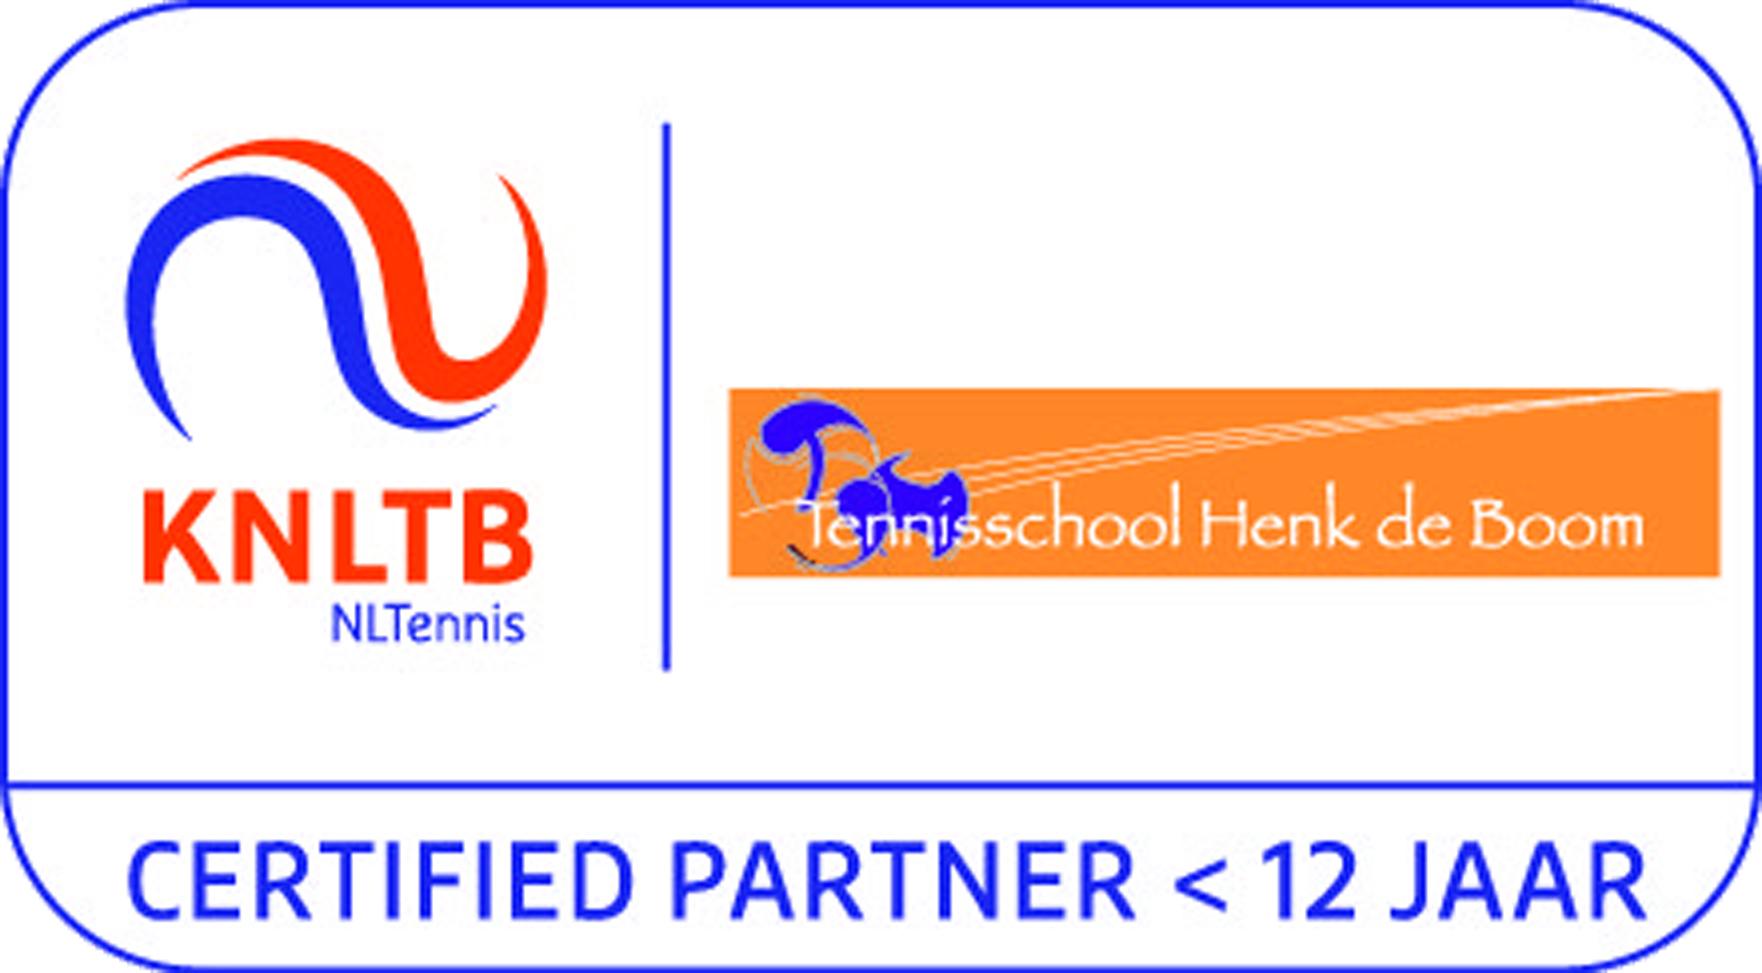 KNLTB certifiedPartner Tennisschool Henk de Boom dubbel pix.jpg